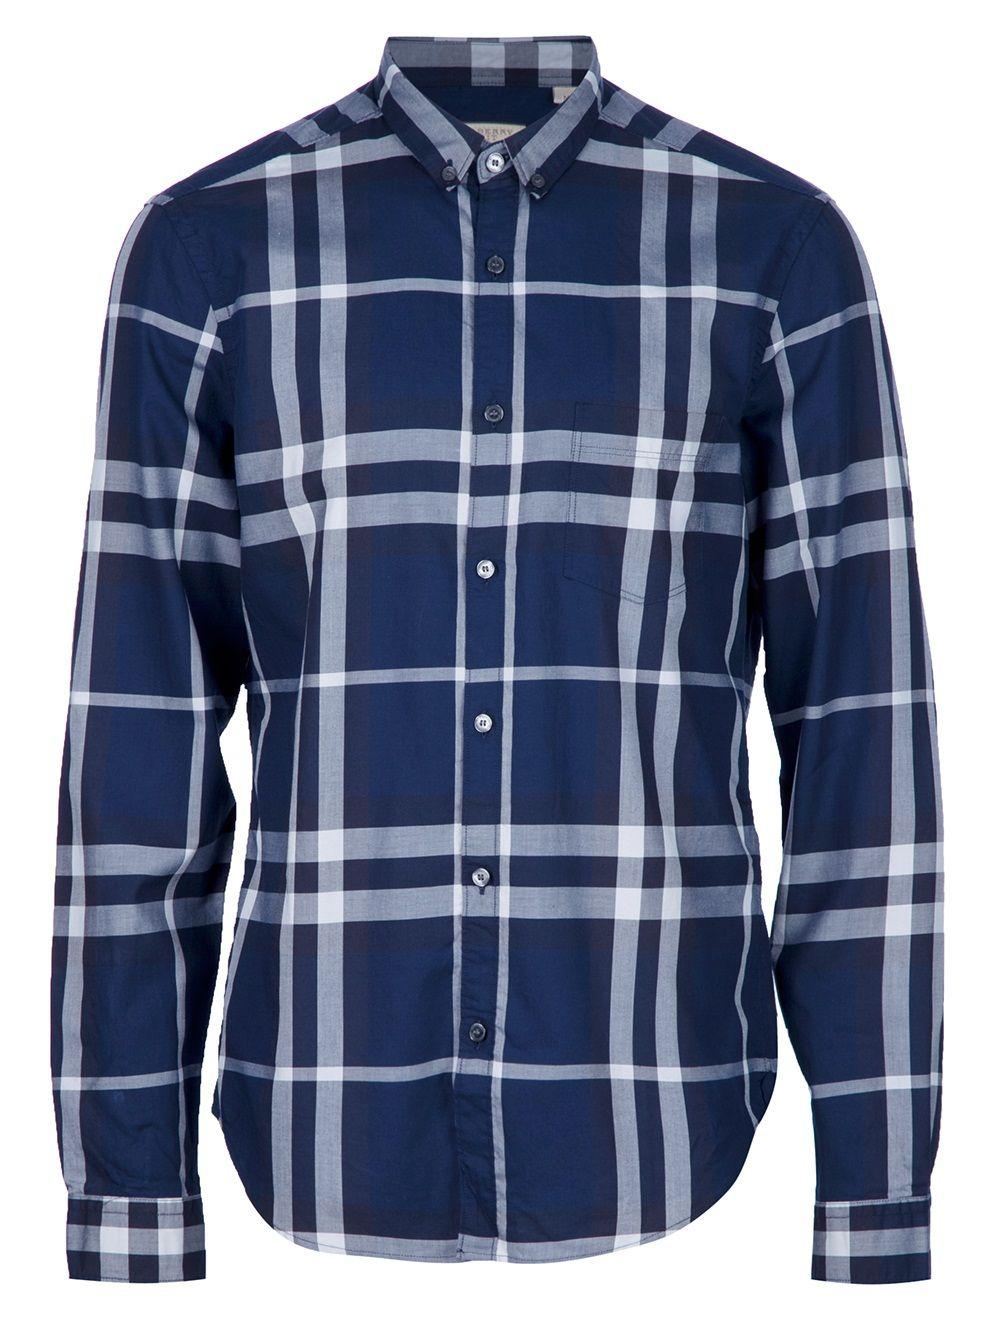 36100826513cf Burberry Brit Camisa Xadrez Azul. - Francis Ferent - farfetch.com.br ...